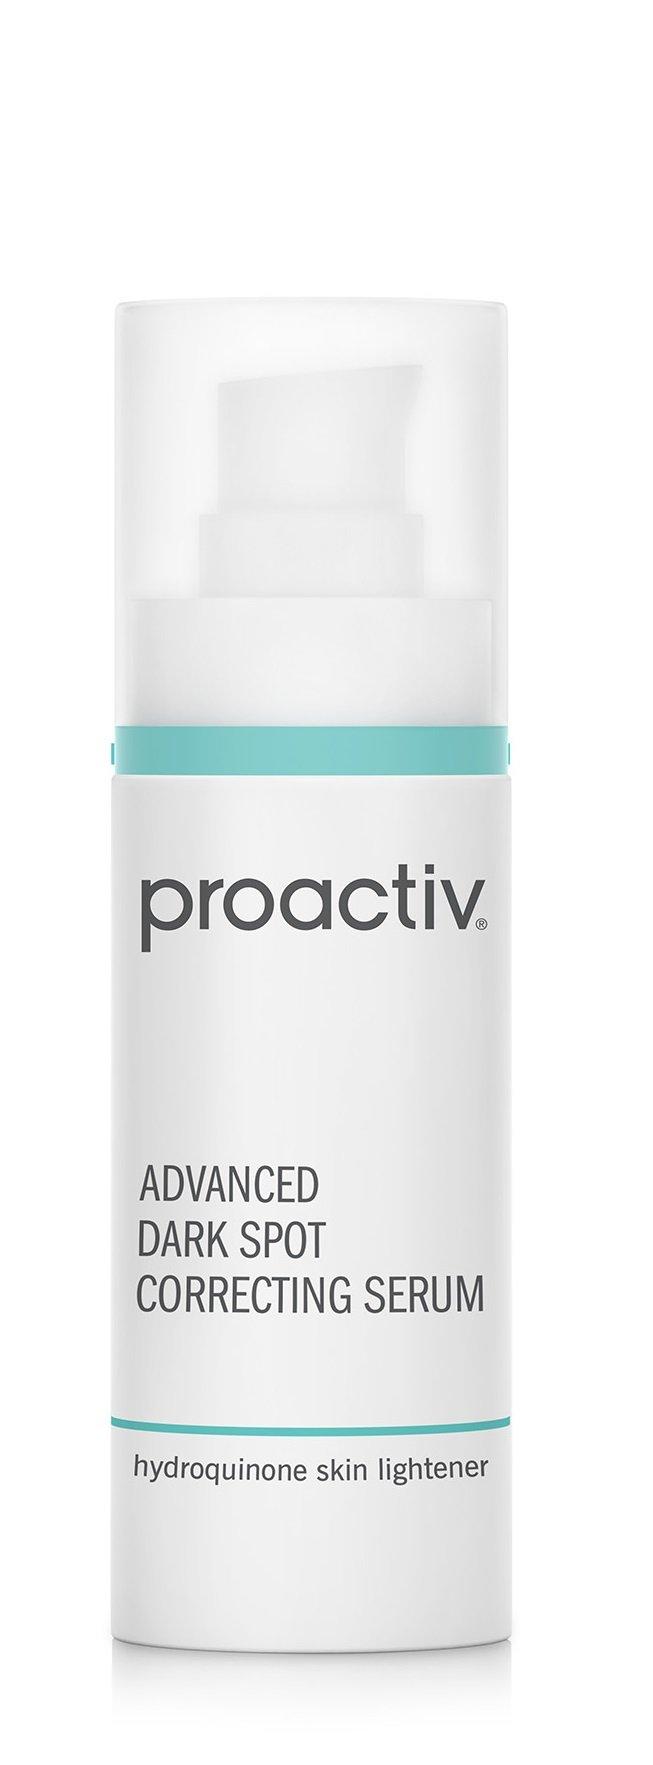 Proactiv Advanced Dark Spot Correcting Serum, 1 oz.